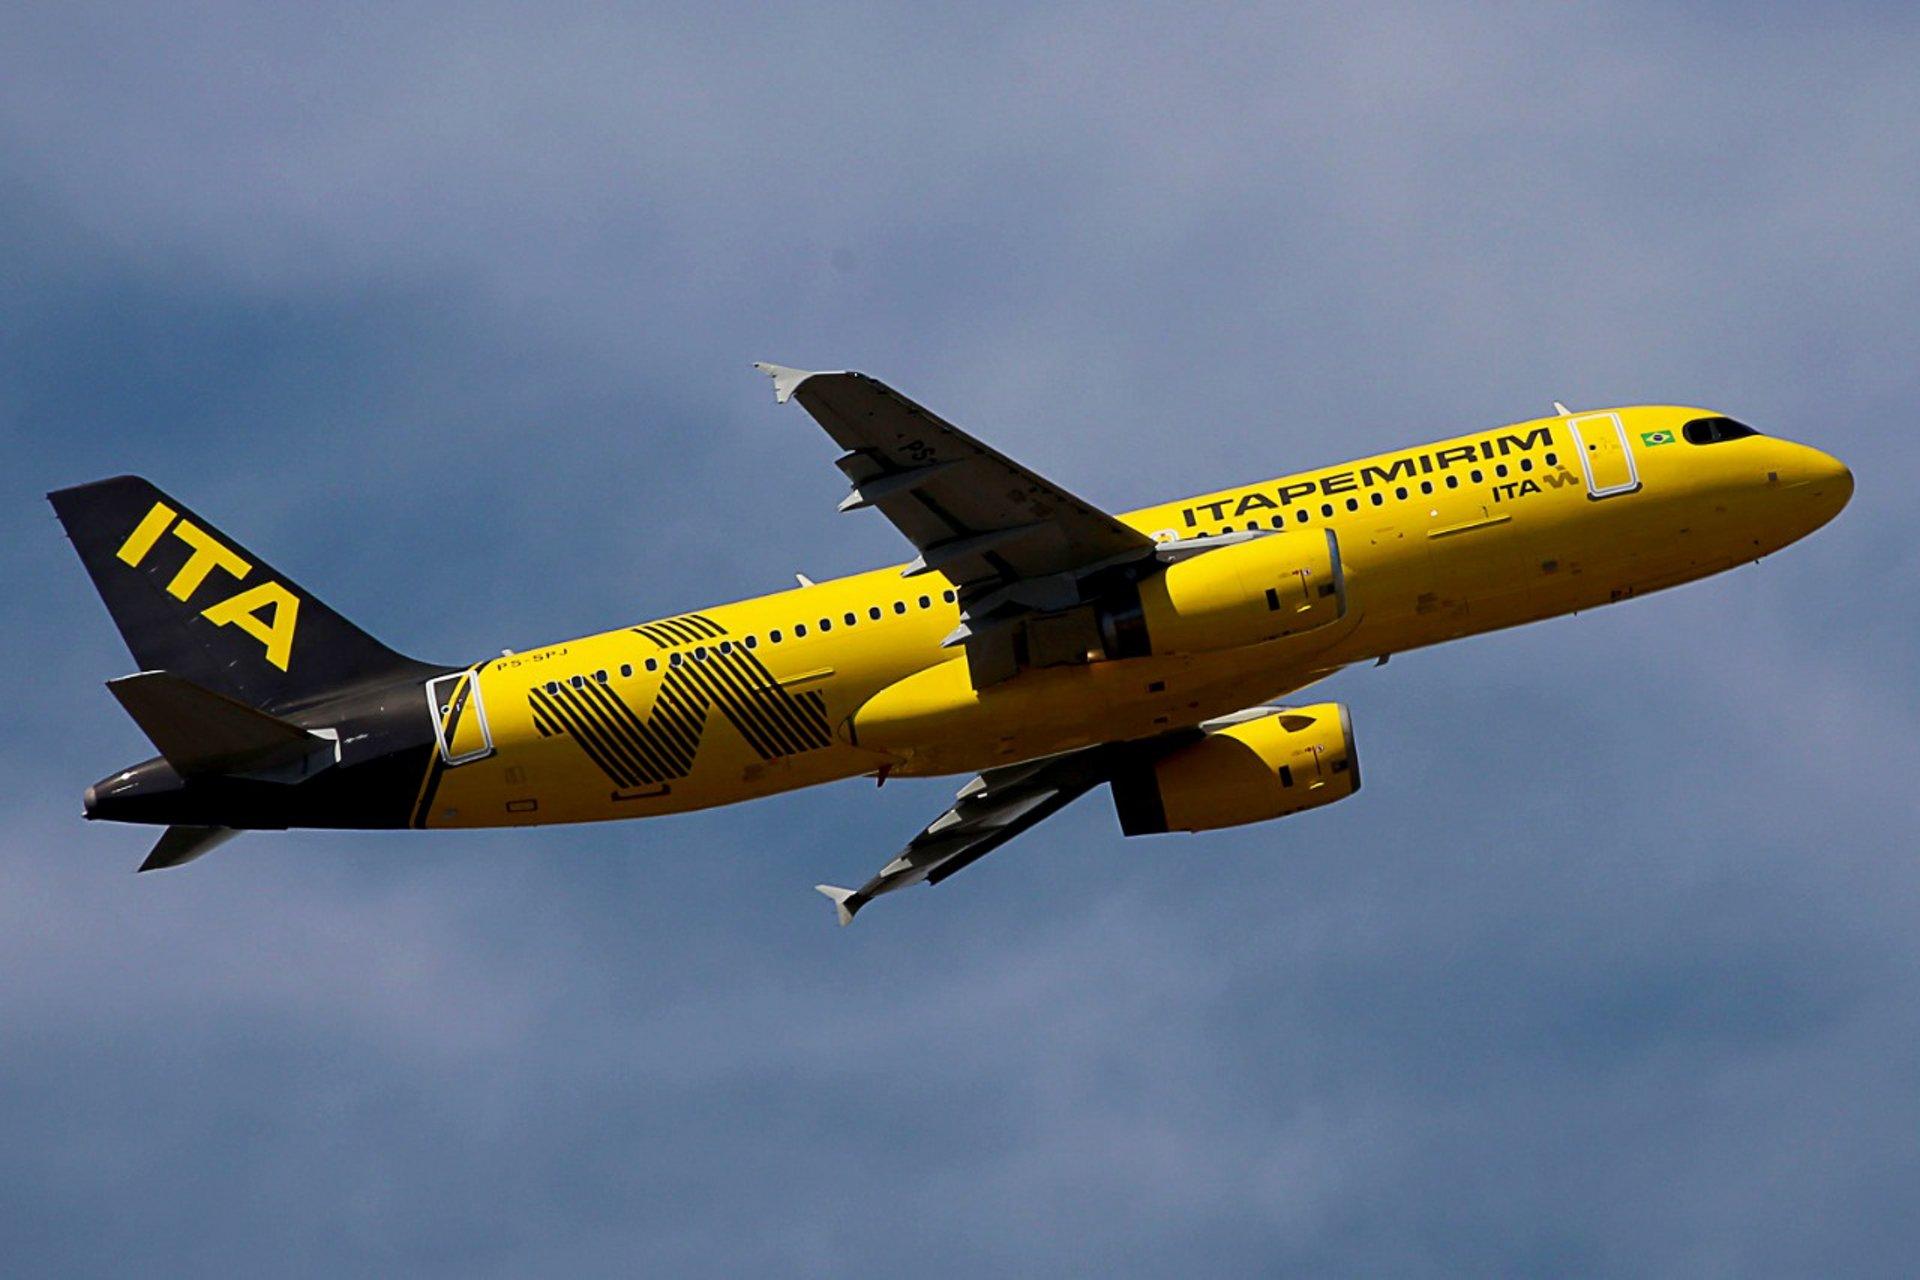 Itapemirim A320 in flight